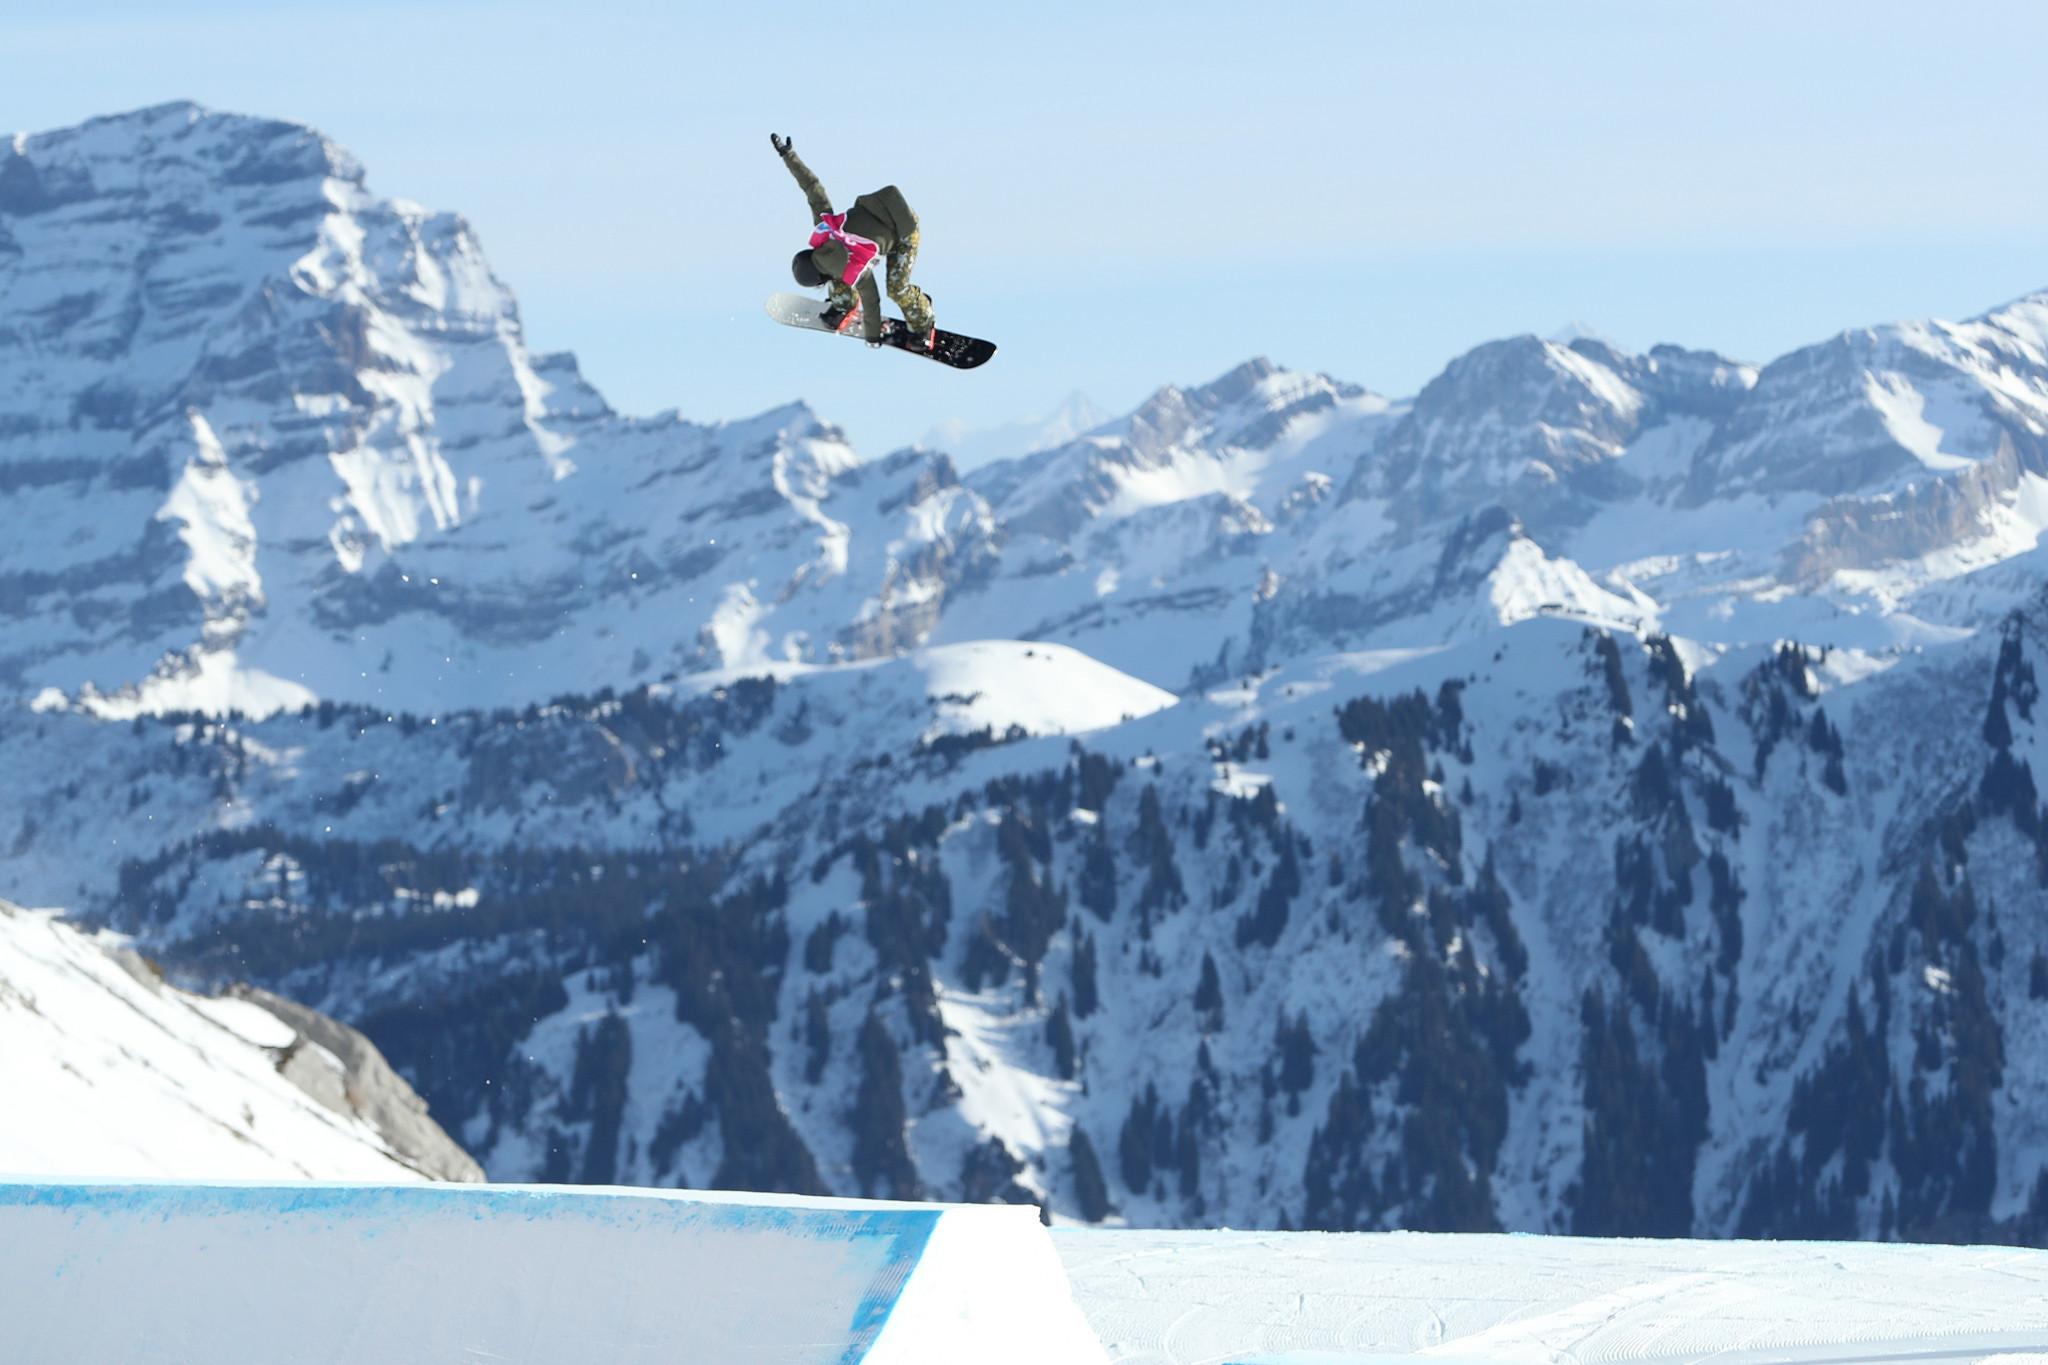 Japan and Belgium claim world junior snowboard slopestyle titles in Krasnoyarsk